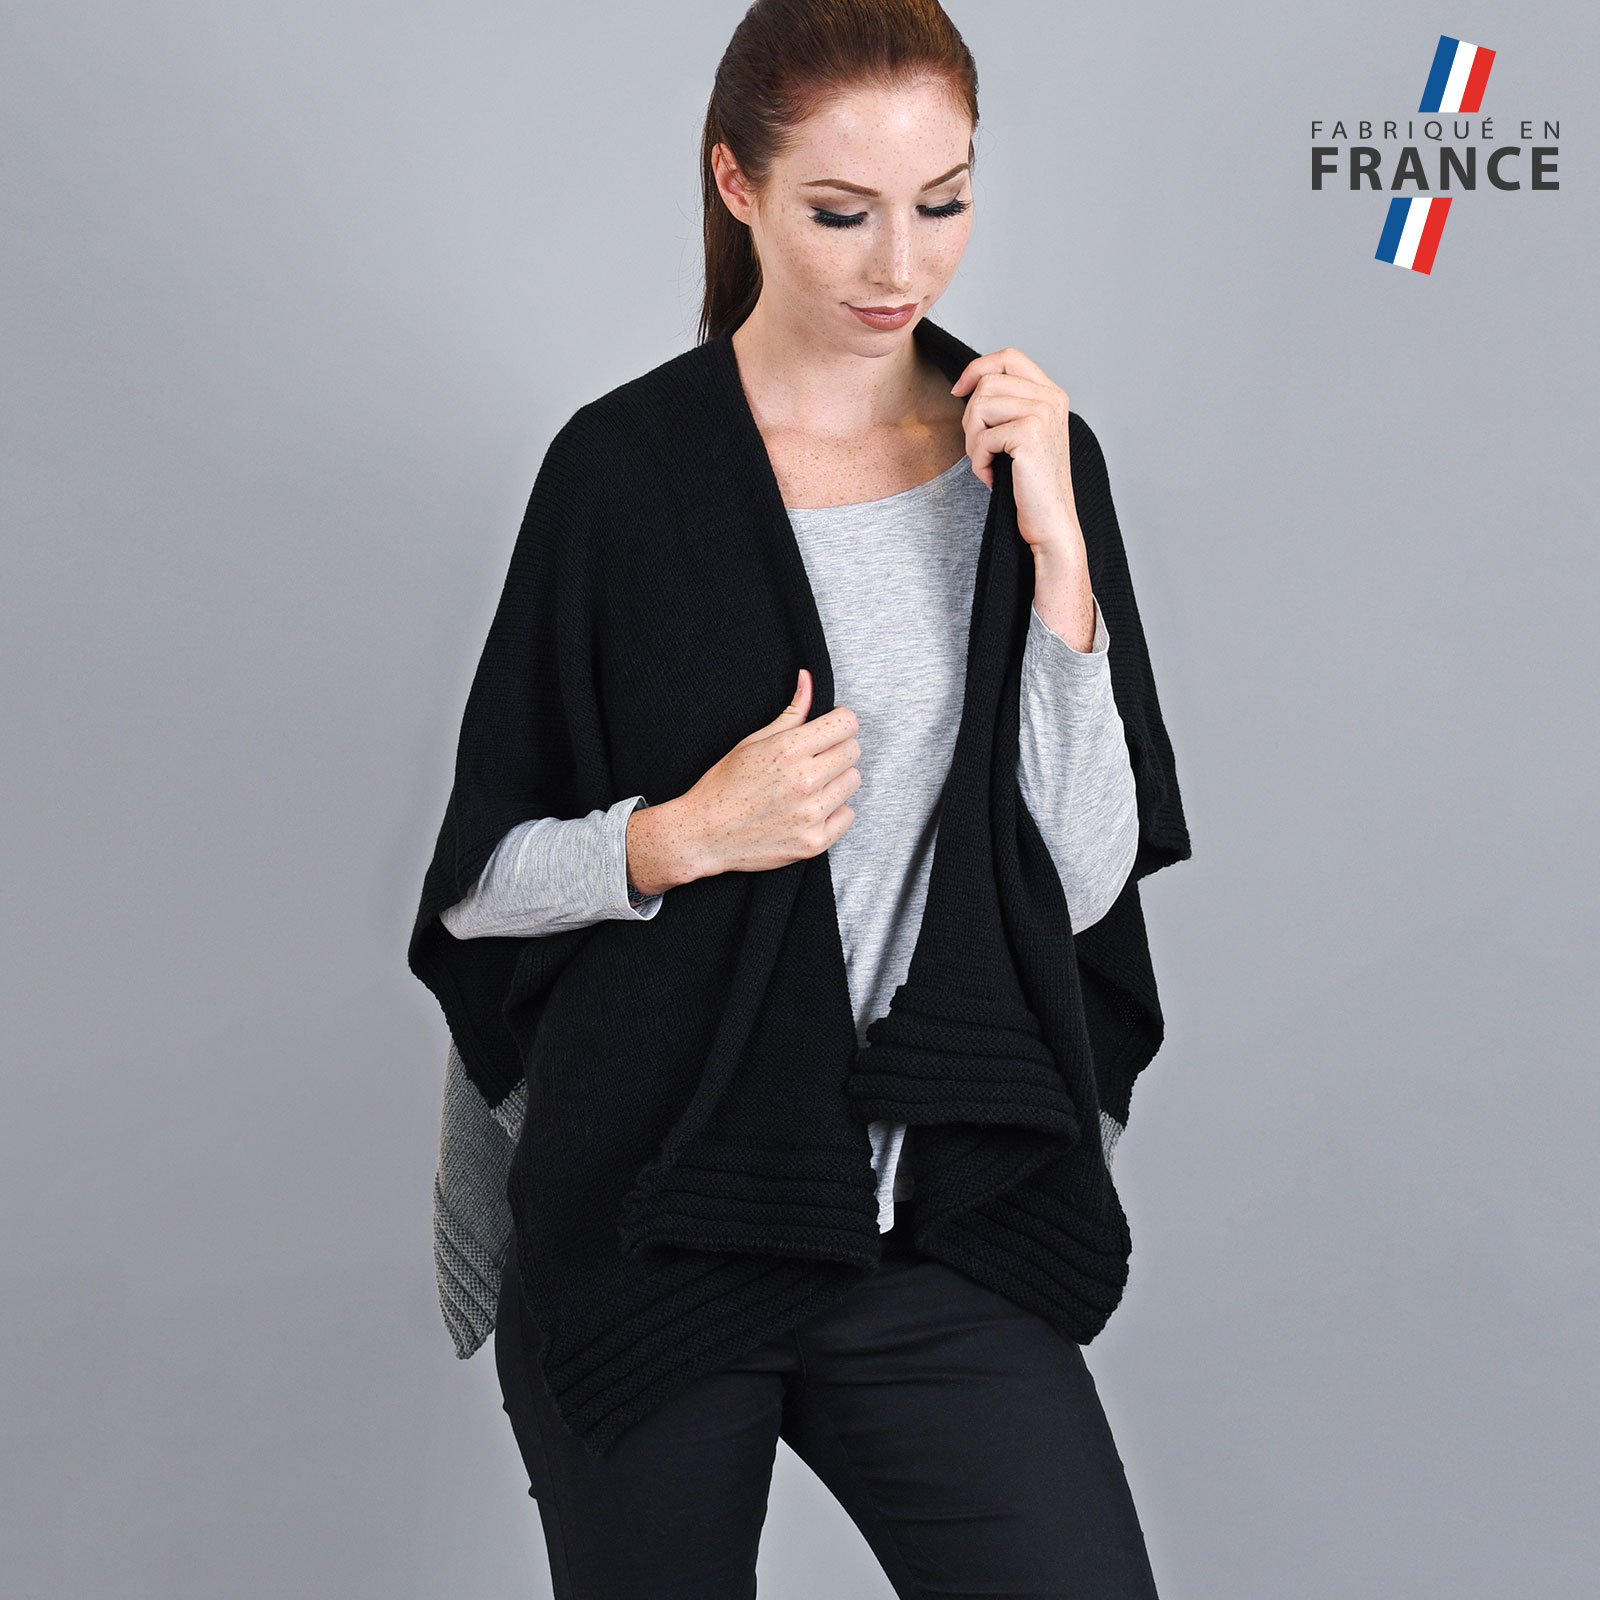 AT-03421-VF16-2-LB_FR-poncho-chaud-bicolore-noir-gris